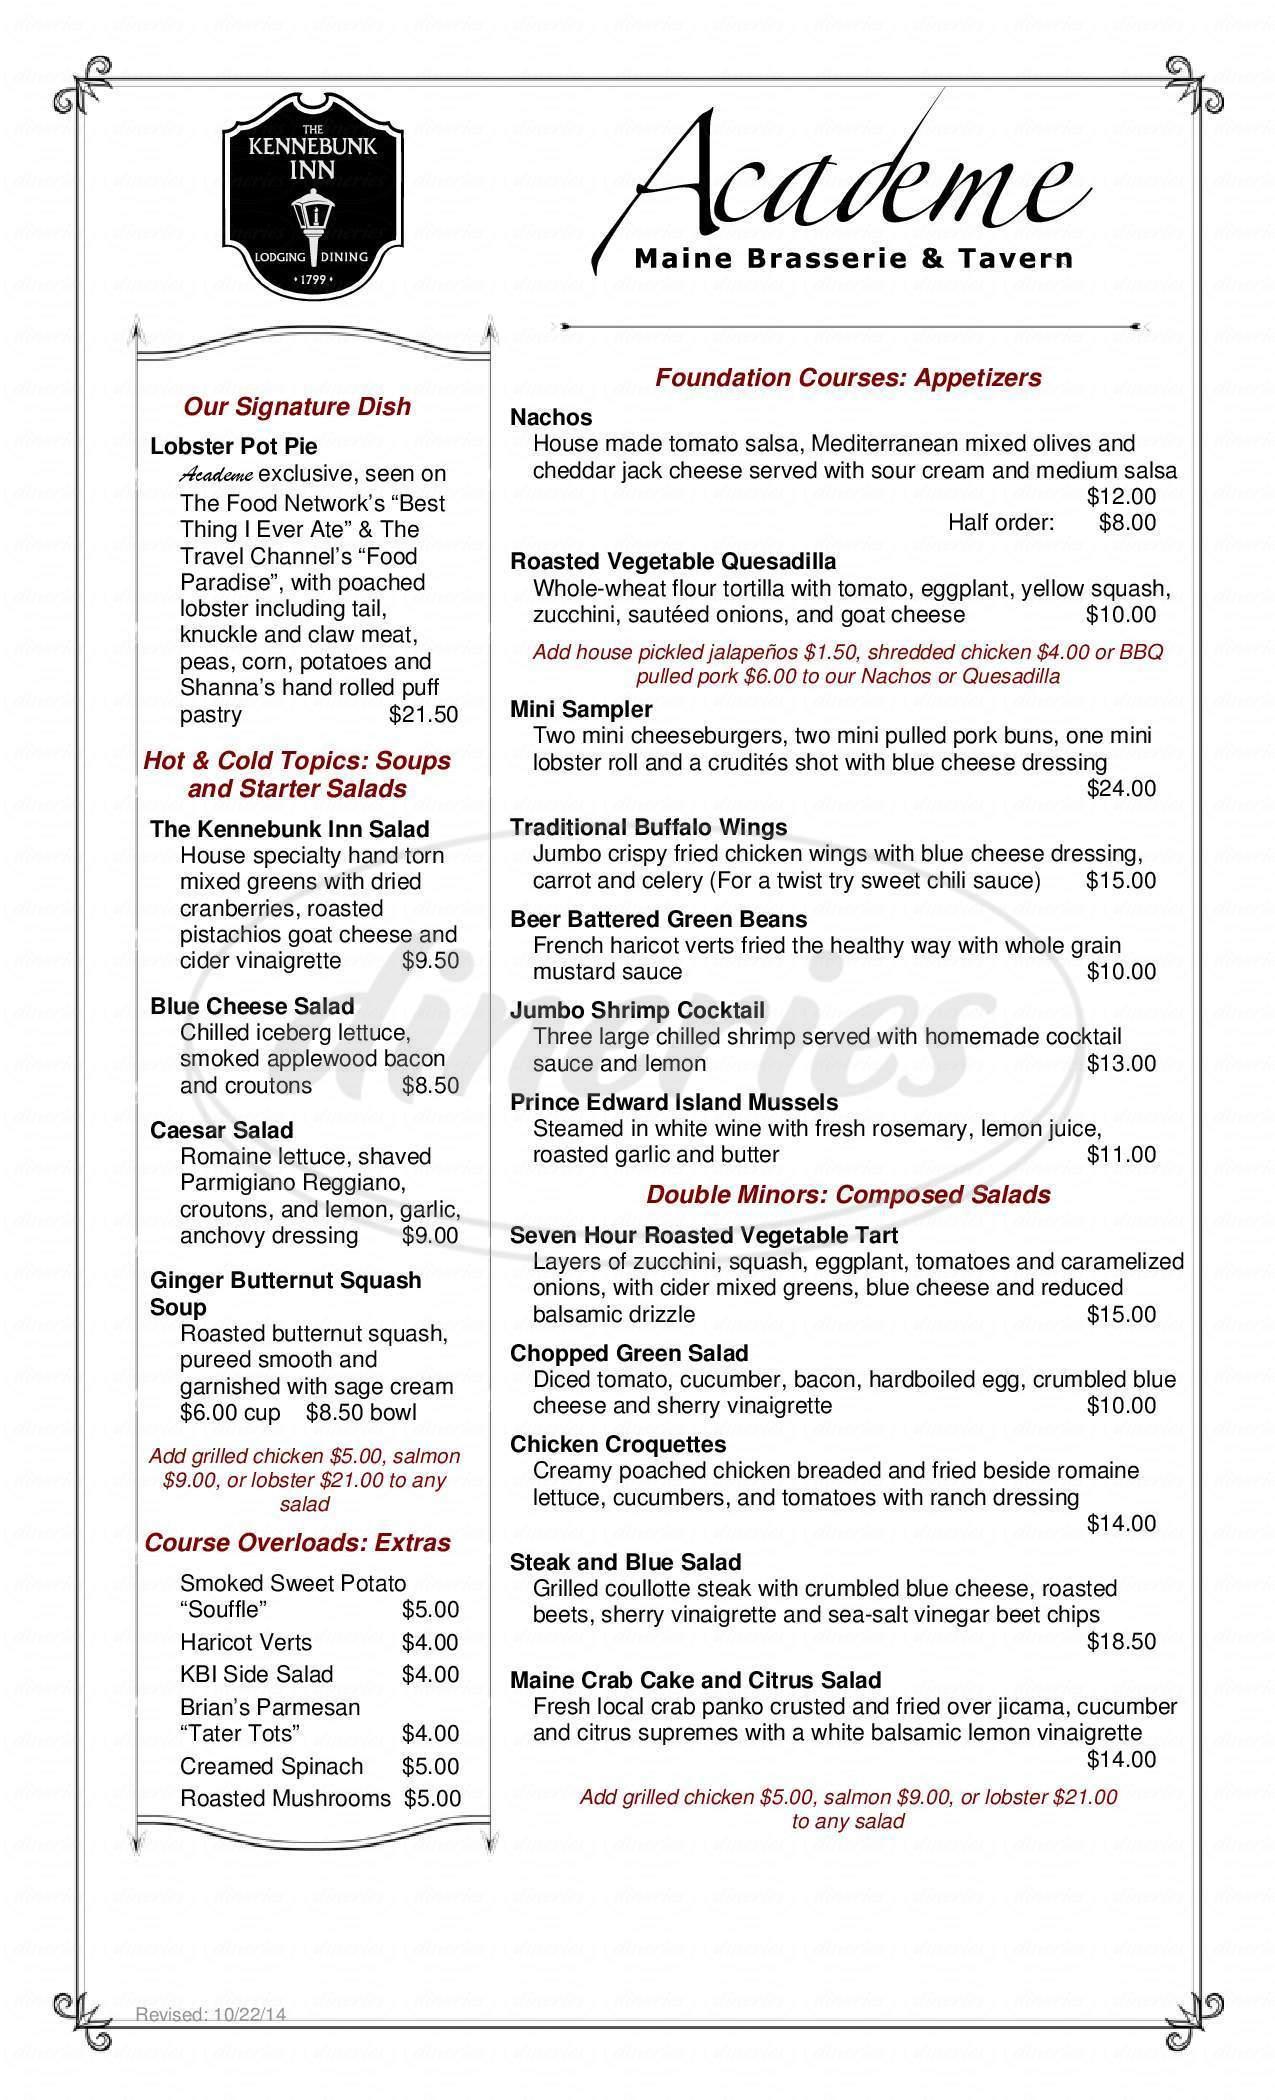 menu for Academe